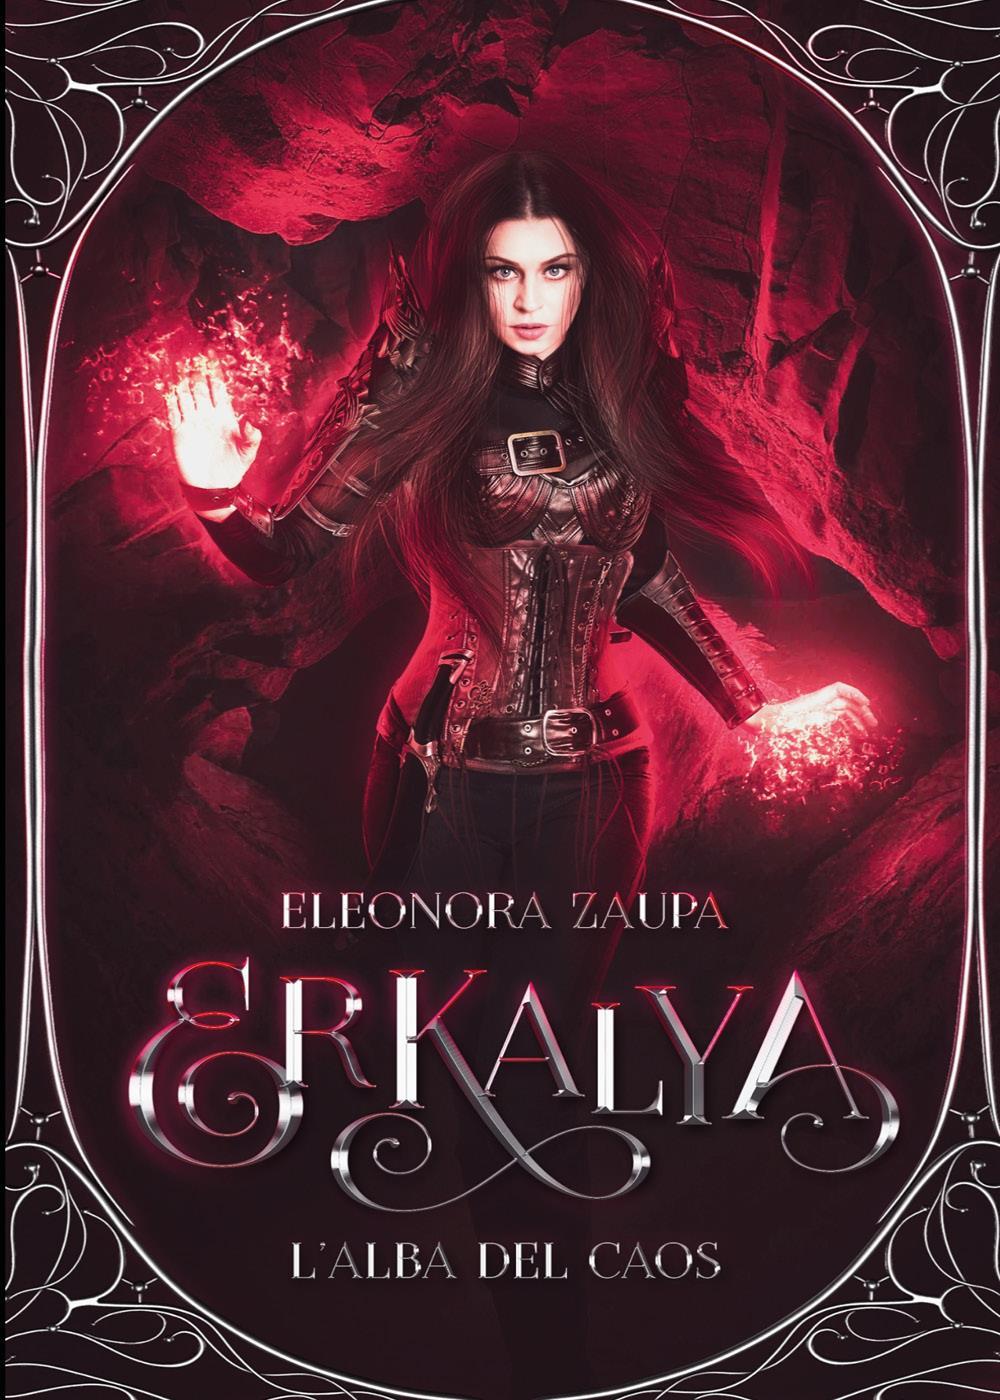 Erkalya - L'alba Del Caos